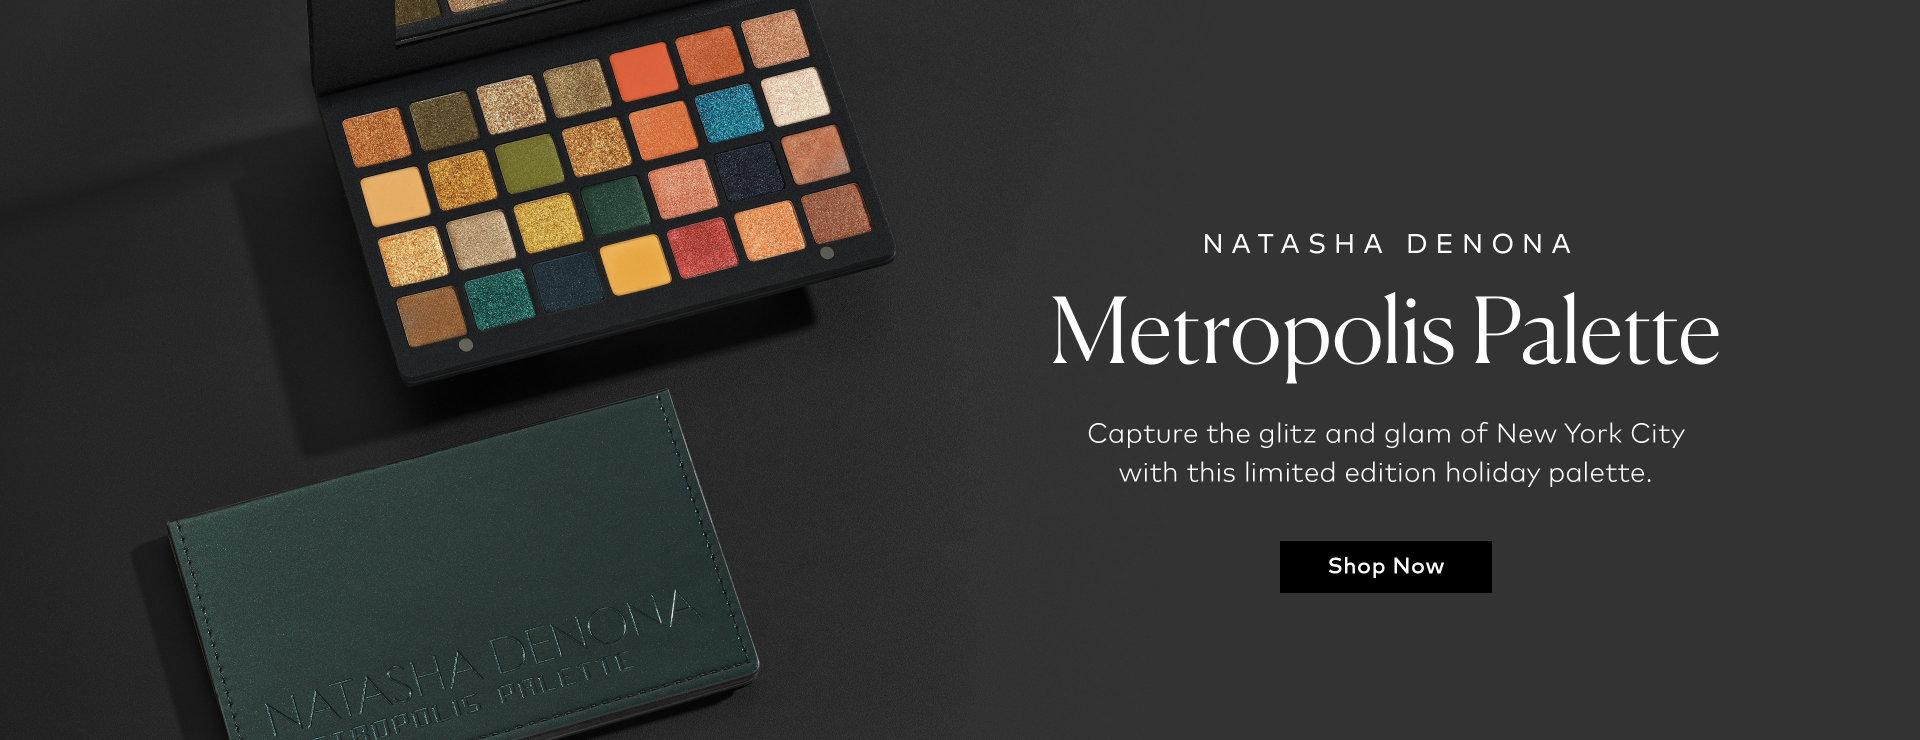 Shop Natasha Denona's Metropolis Palette on Beautylish.com